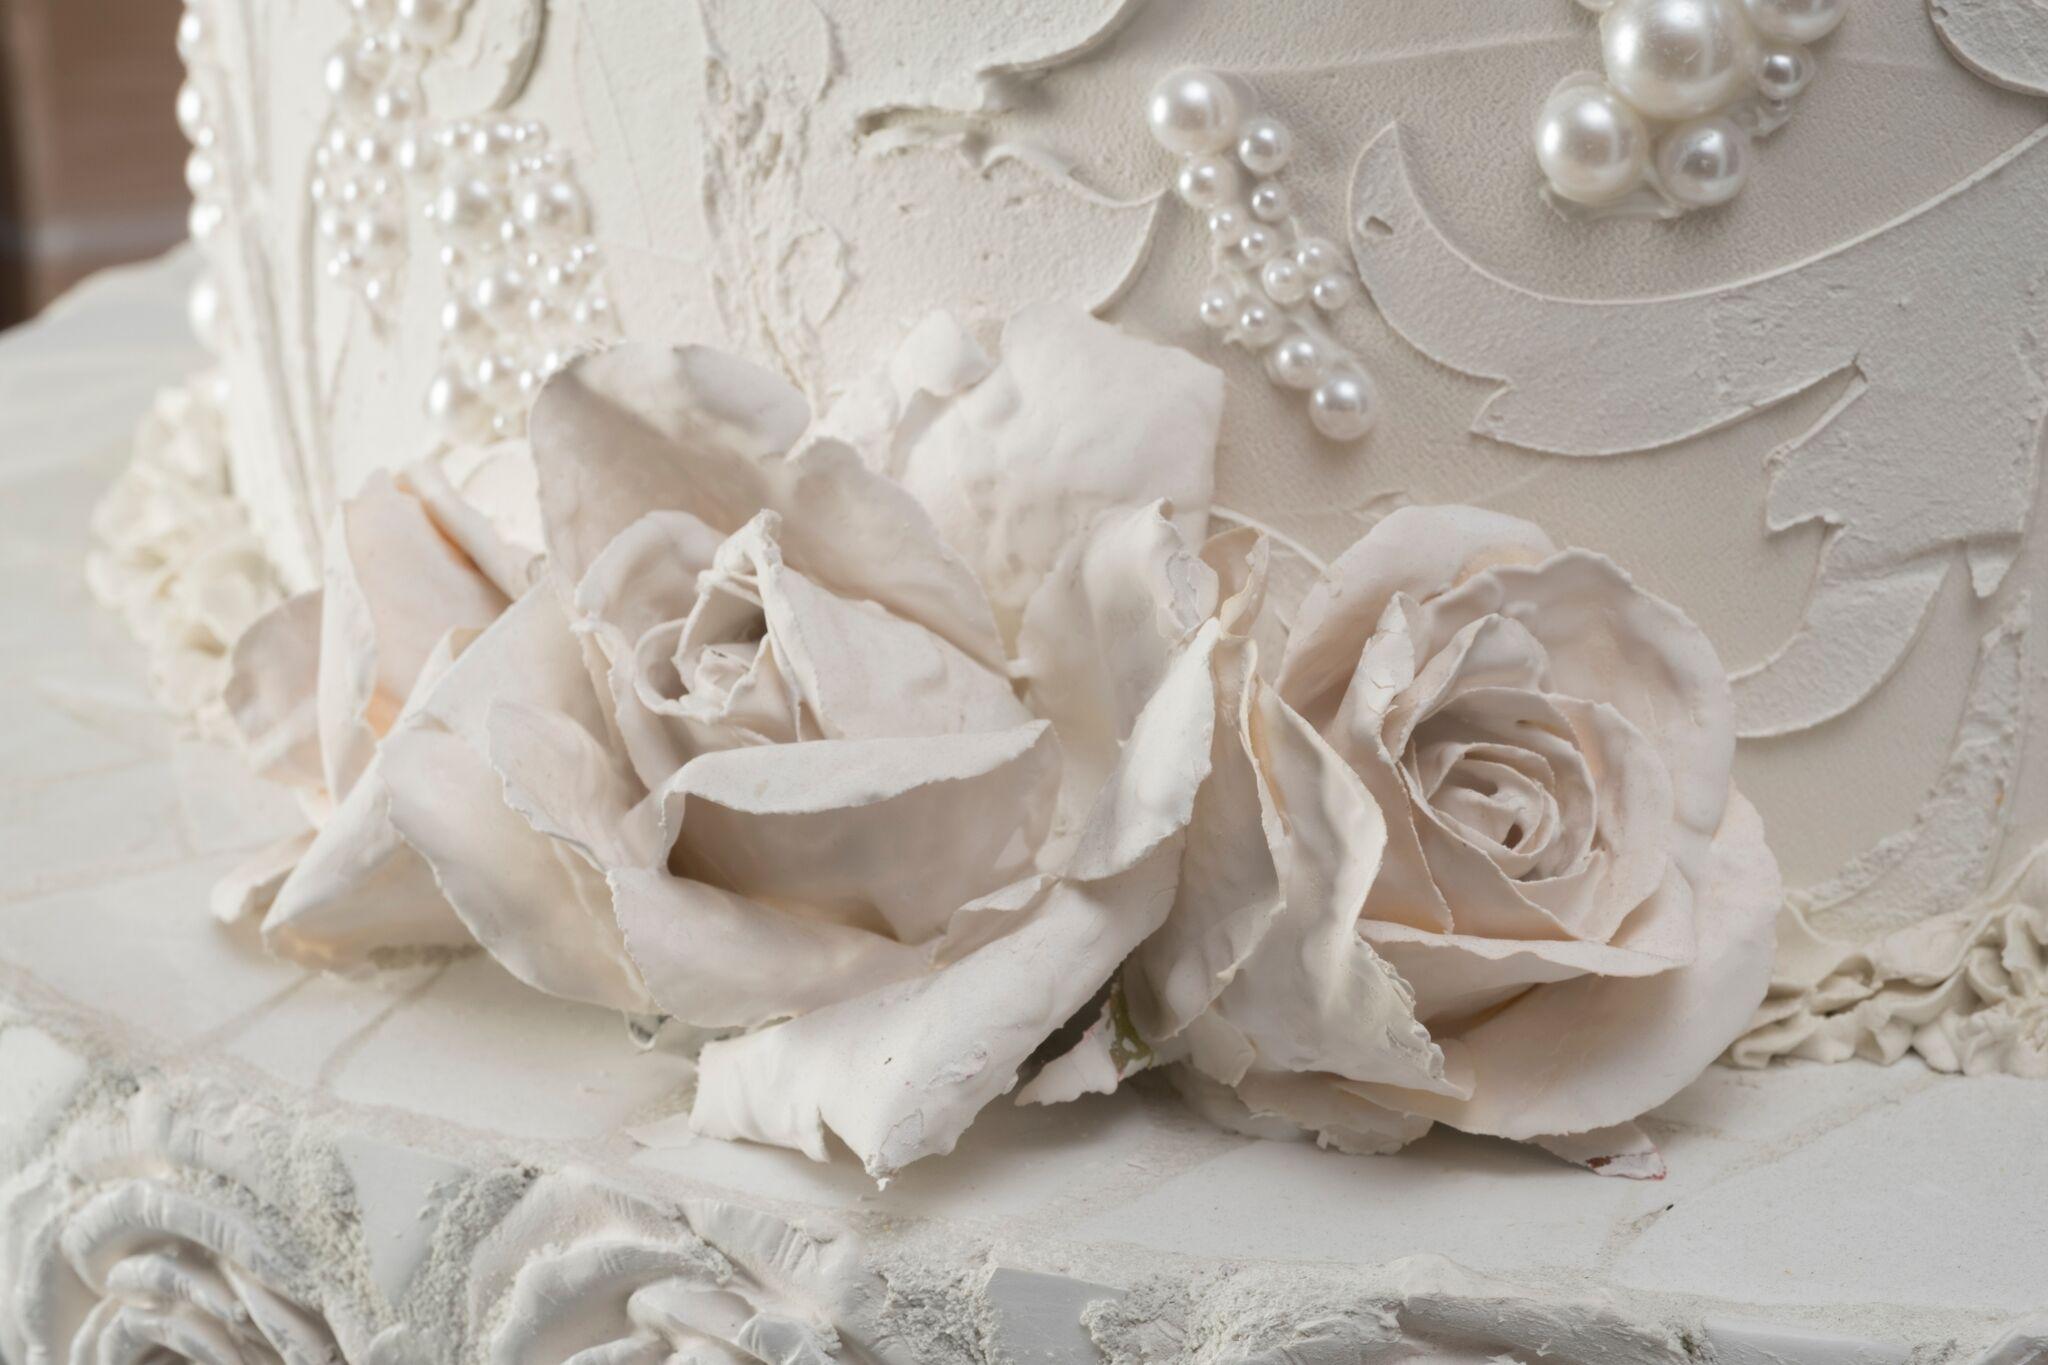 Jeff Monsein - The Royal Wedding Cake House - Image 3 of 9